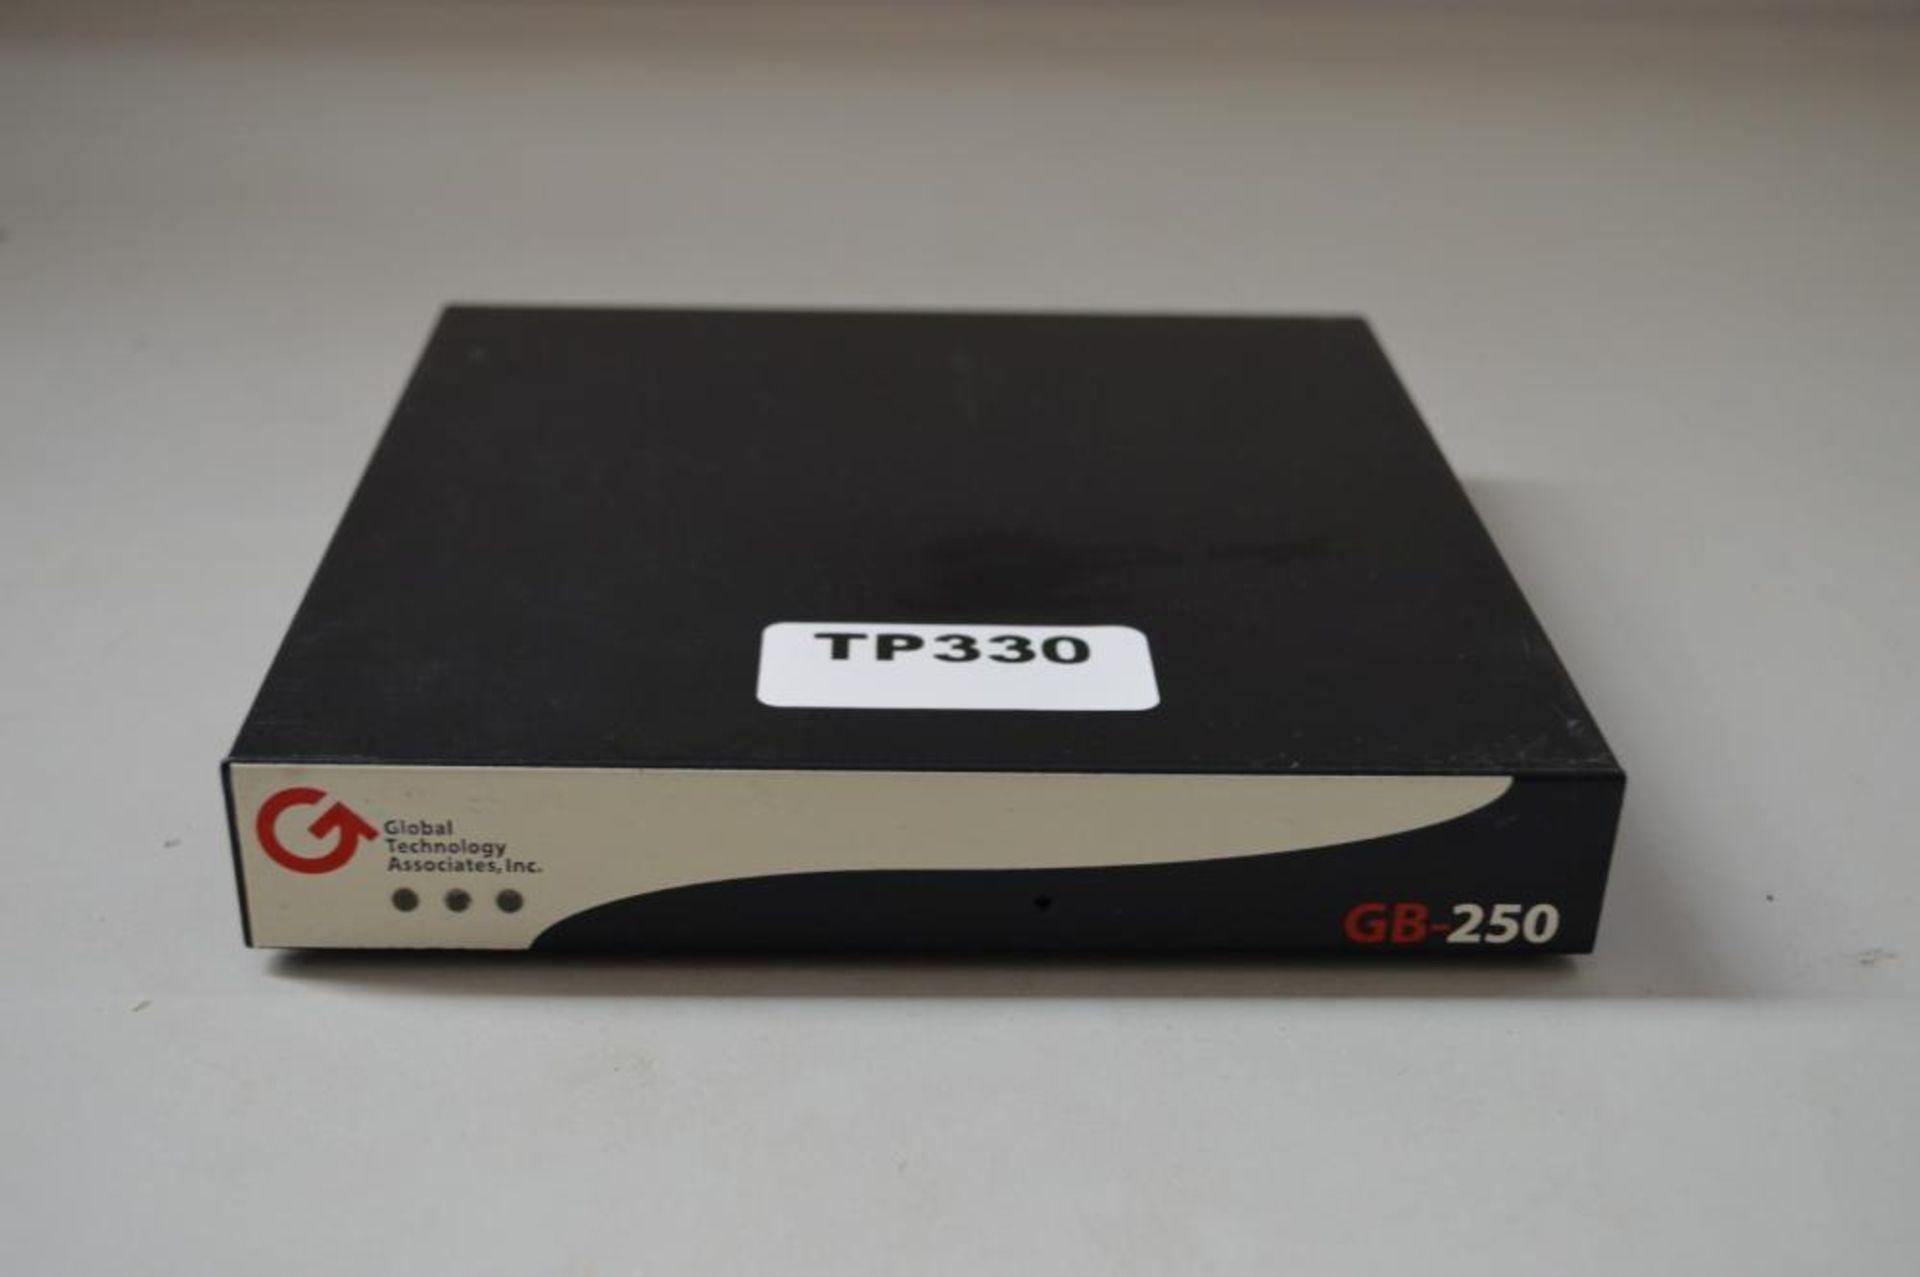 Lot 3622 - 1 x Global Technology Associates GTA GB-250 Network Security Firewall - Ref TP330 - CL394 - Locatio